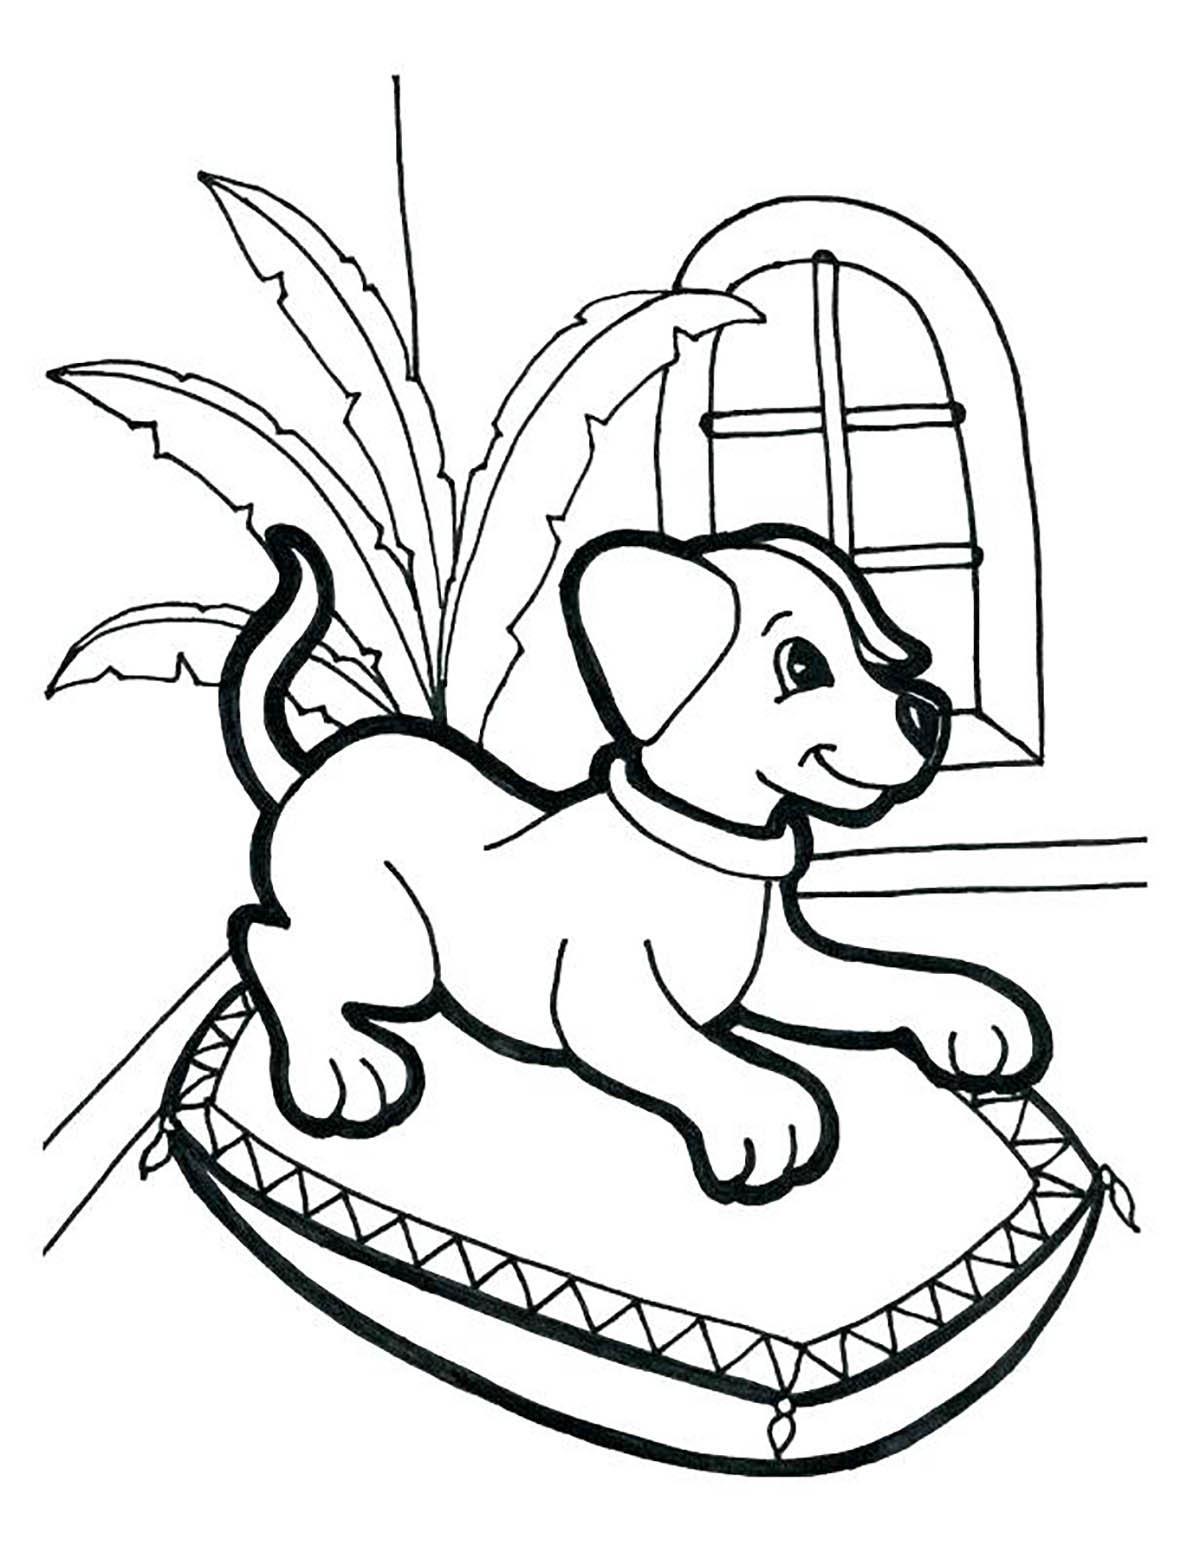 Dog To Print Obe Nt Dog